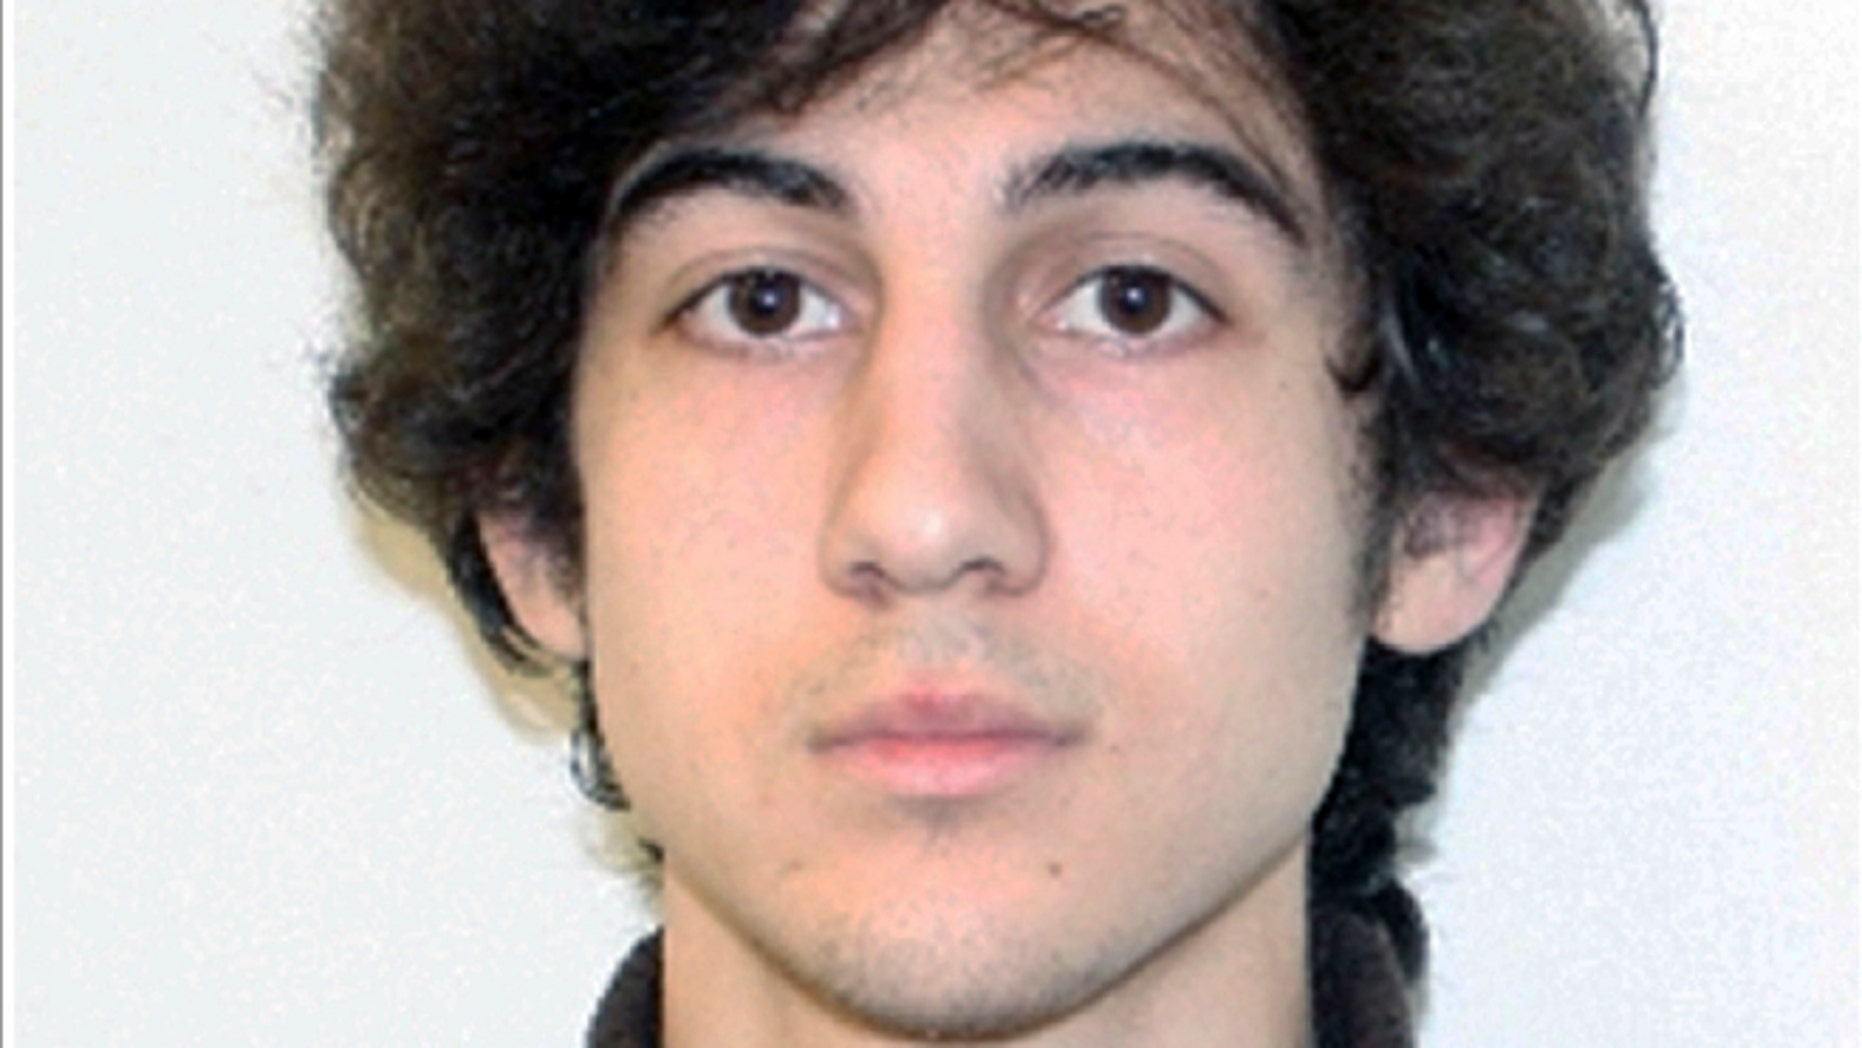 This 2013 file photo shows Boston Marathon bomber Dzhokhar Tsarnaev.